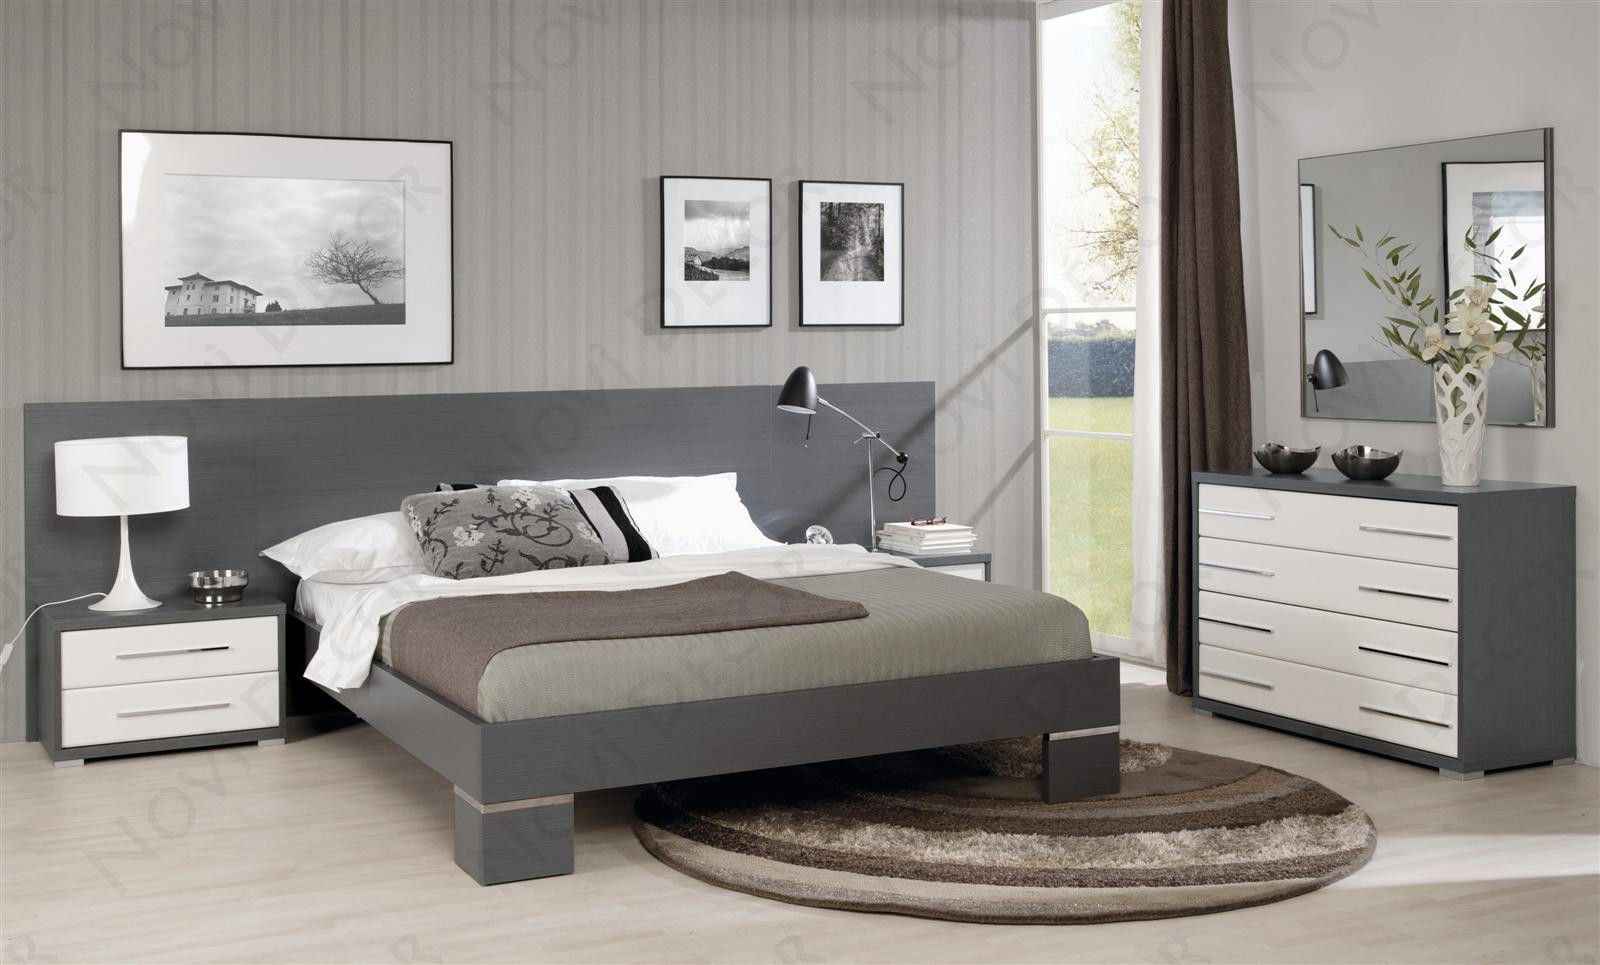 How to buy premium grey bedroom furniture set - Designalls